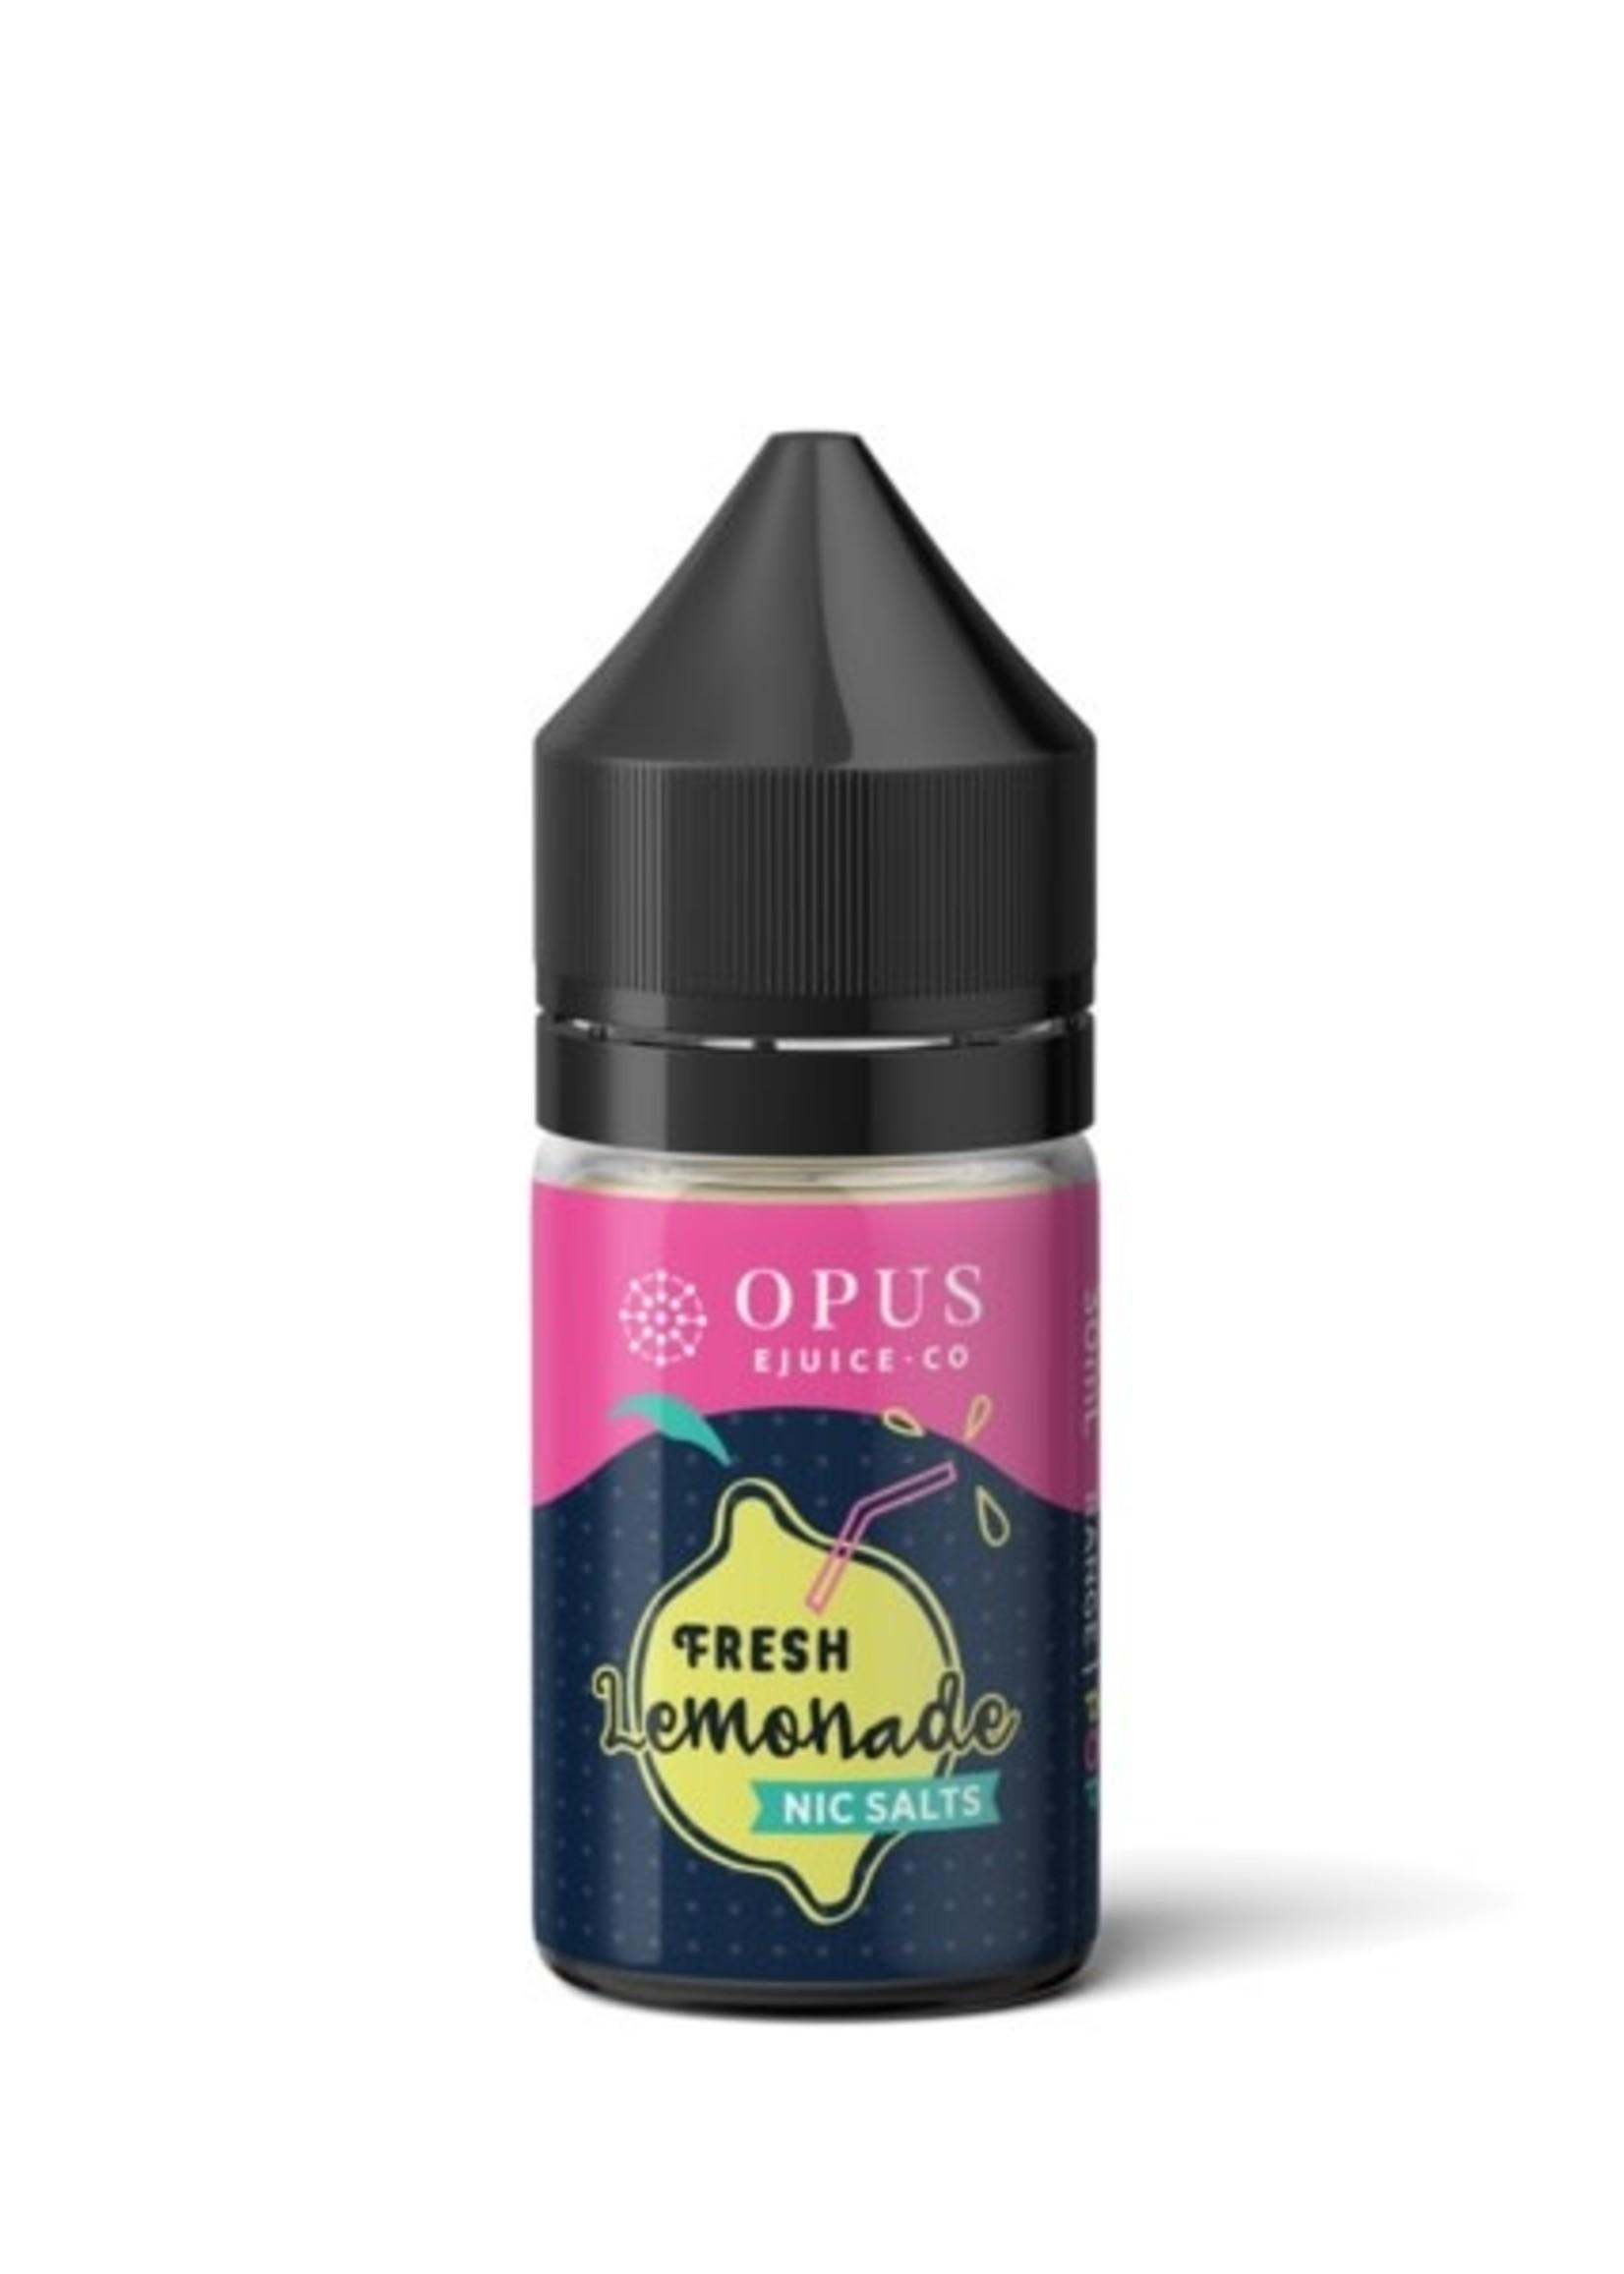 Opus Vape flavour - Fresh lemonade salts 30ml- 20mg